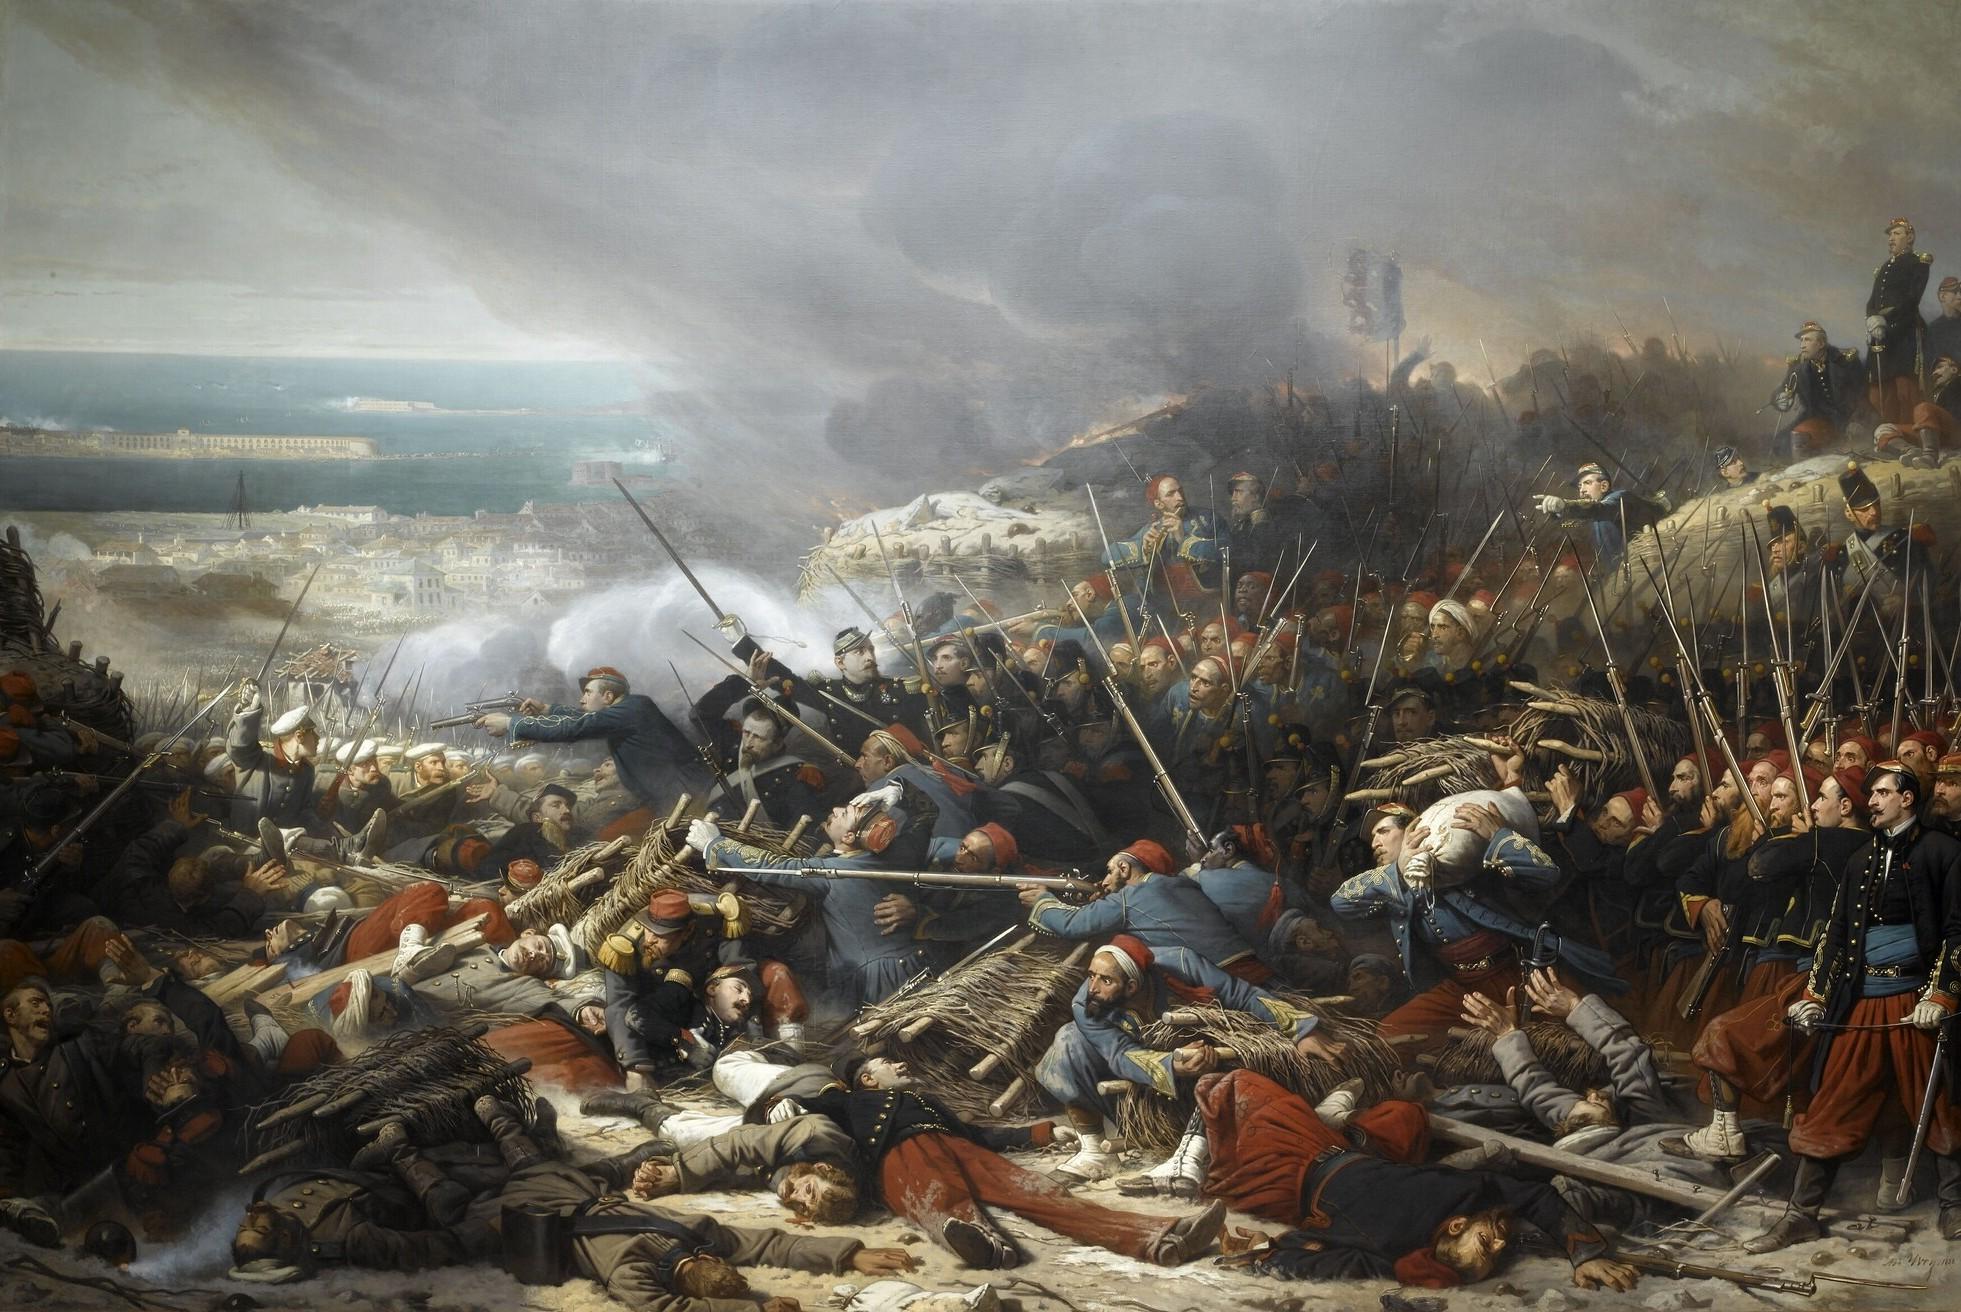 http://upload.wikimedia.org/wikipedia/commons/d/db/Combat_dans_la_gorge_de_Malakoff,_le_8_septembre_1855_(par_Adolphe_Yvon).jpg